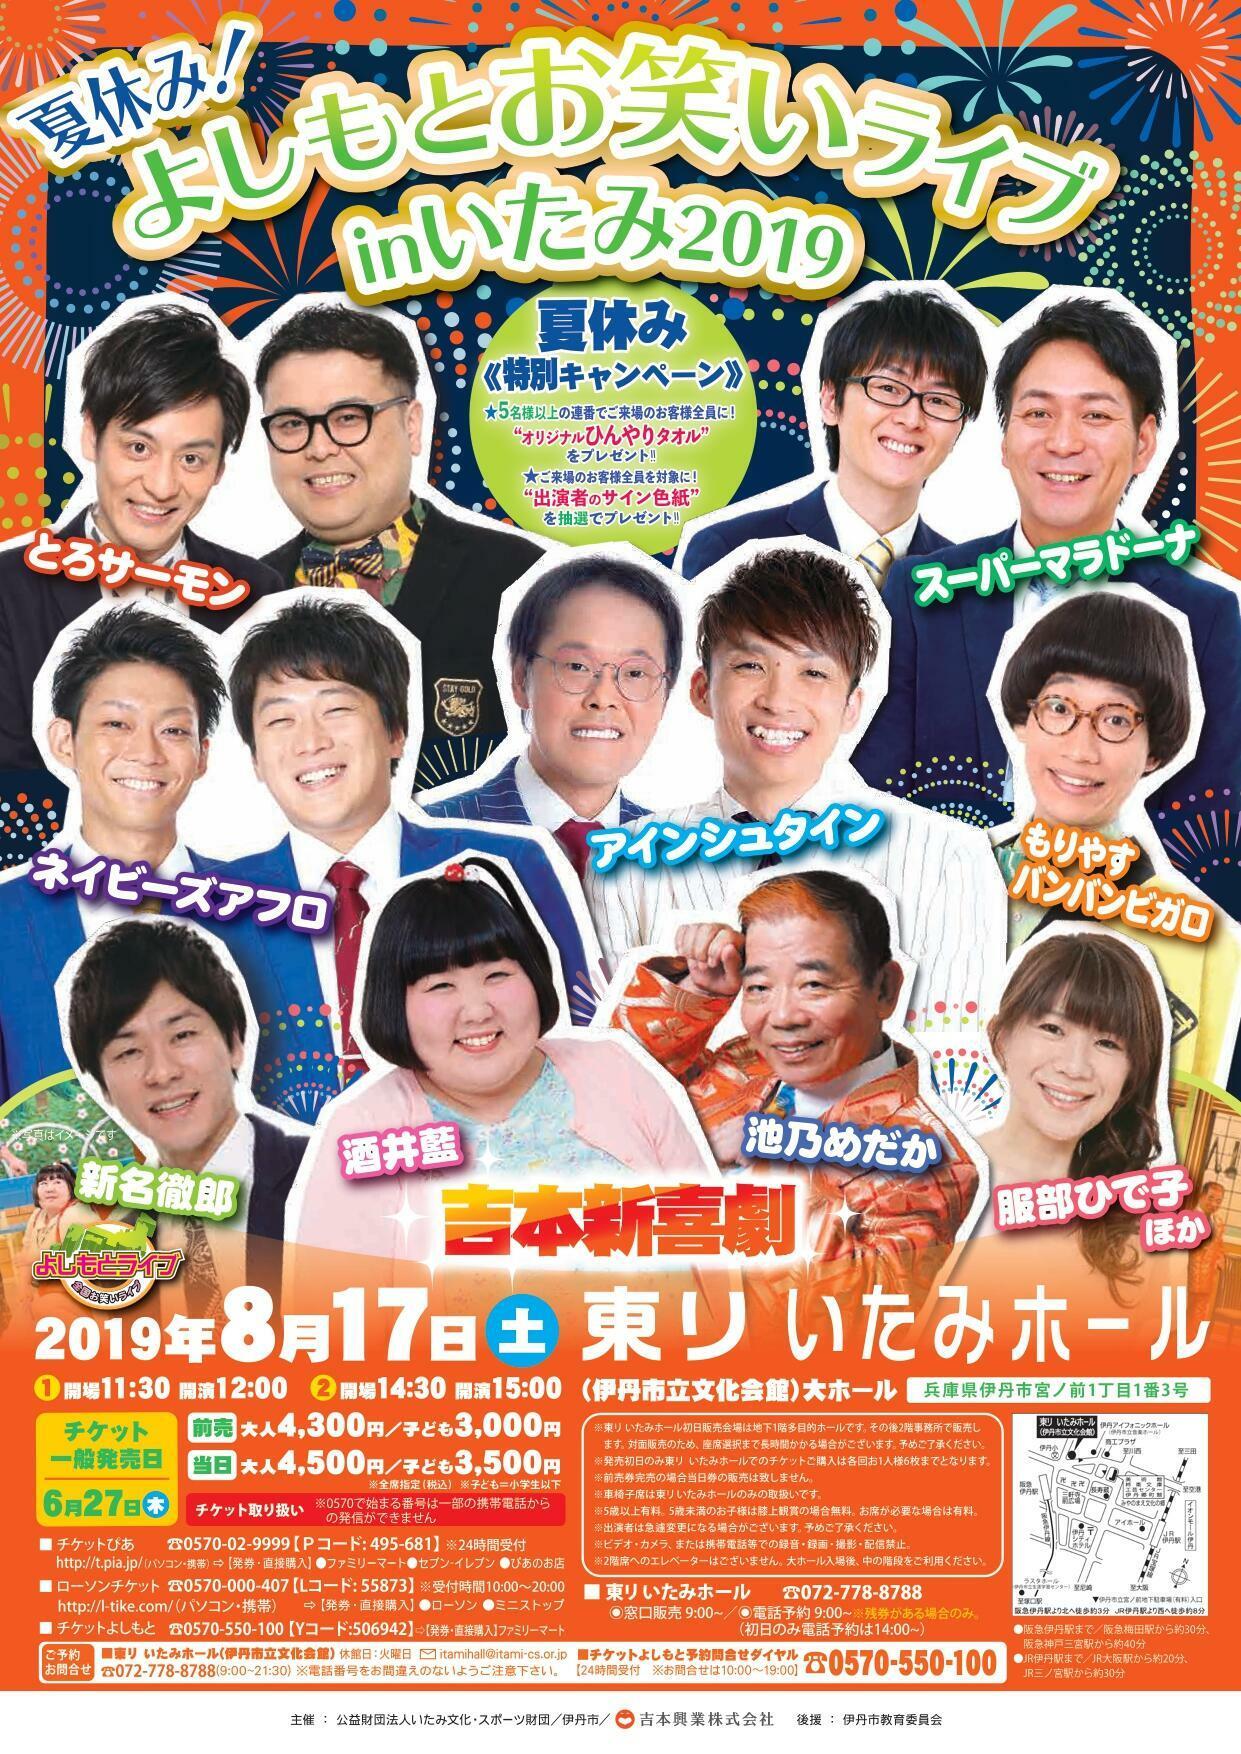 http://www.syumatsu.jp/20190617122701-5e2ed094cbf1253012d34485e926d86ddbcab6ab.jpg